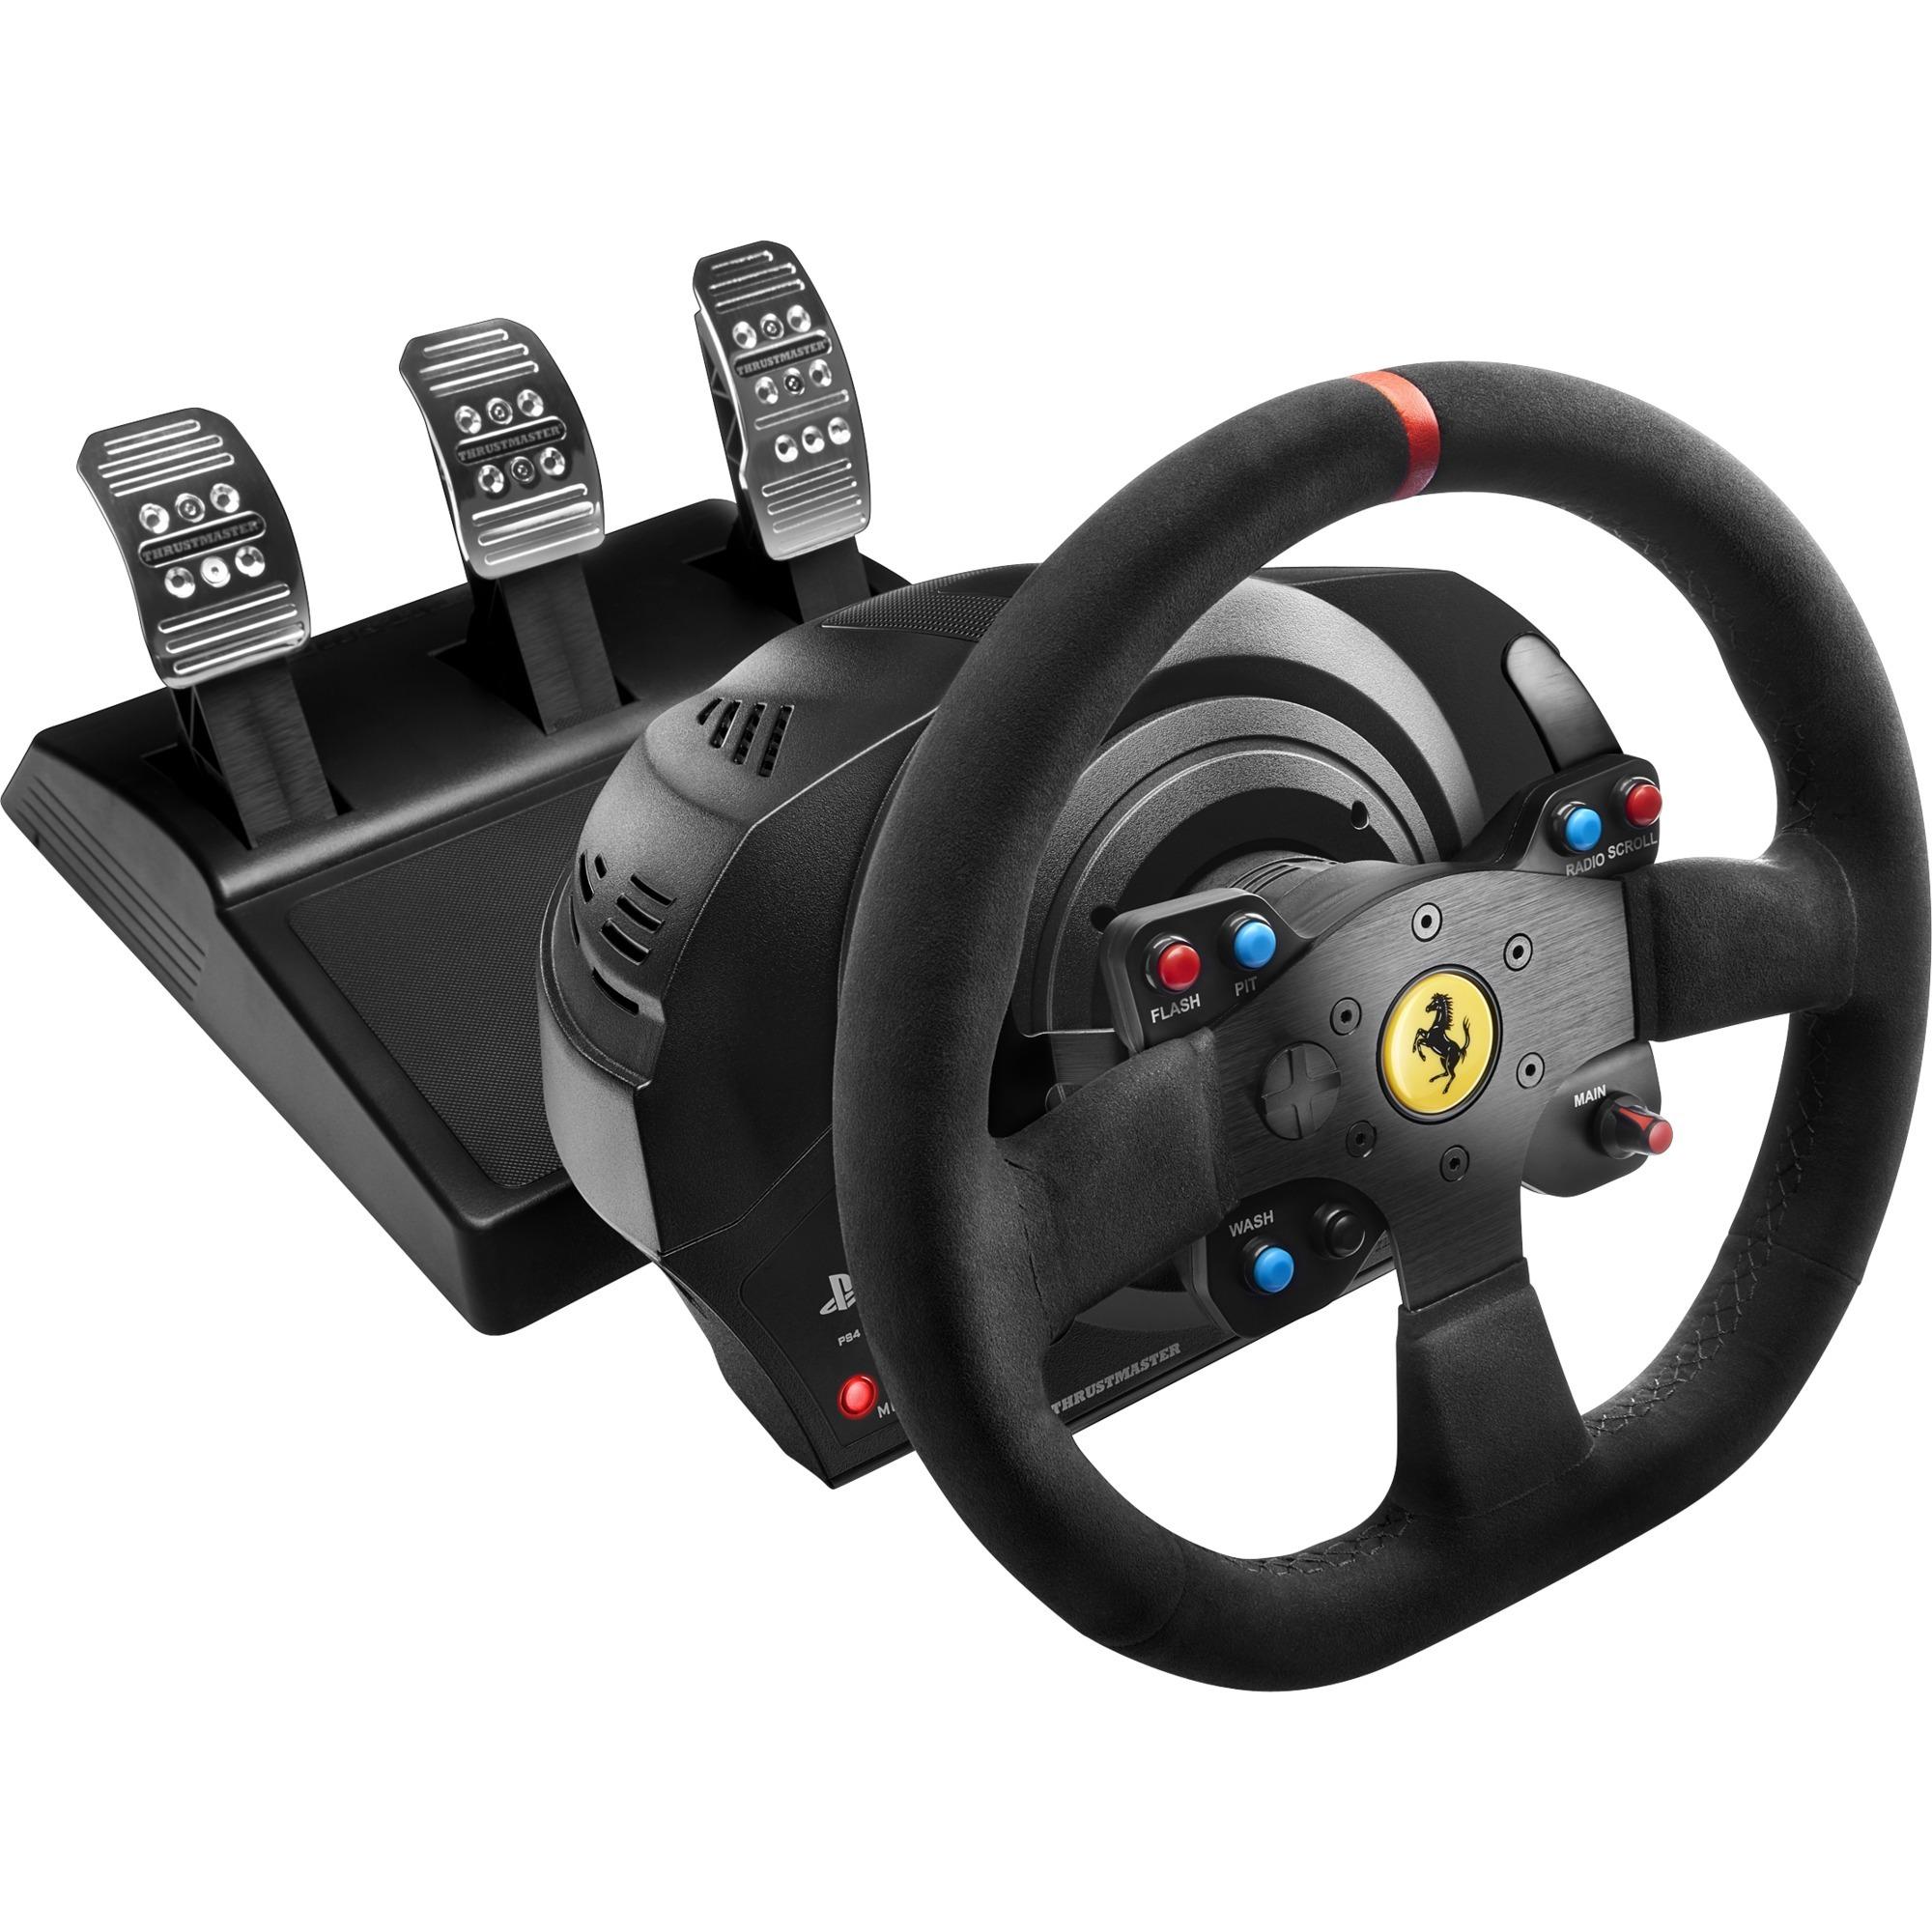 T300 Ferrari Integral Racing Wheel (Alcantara Edition)